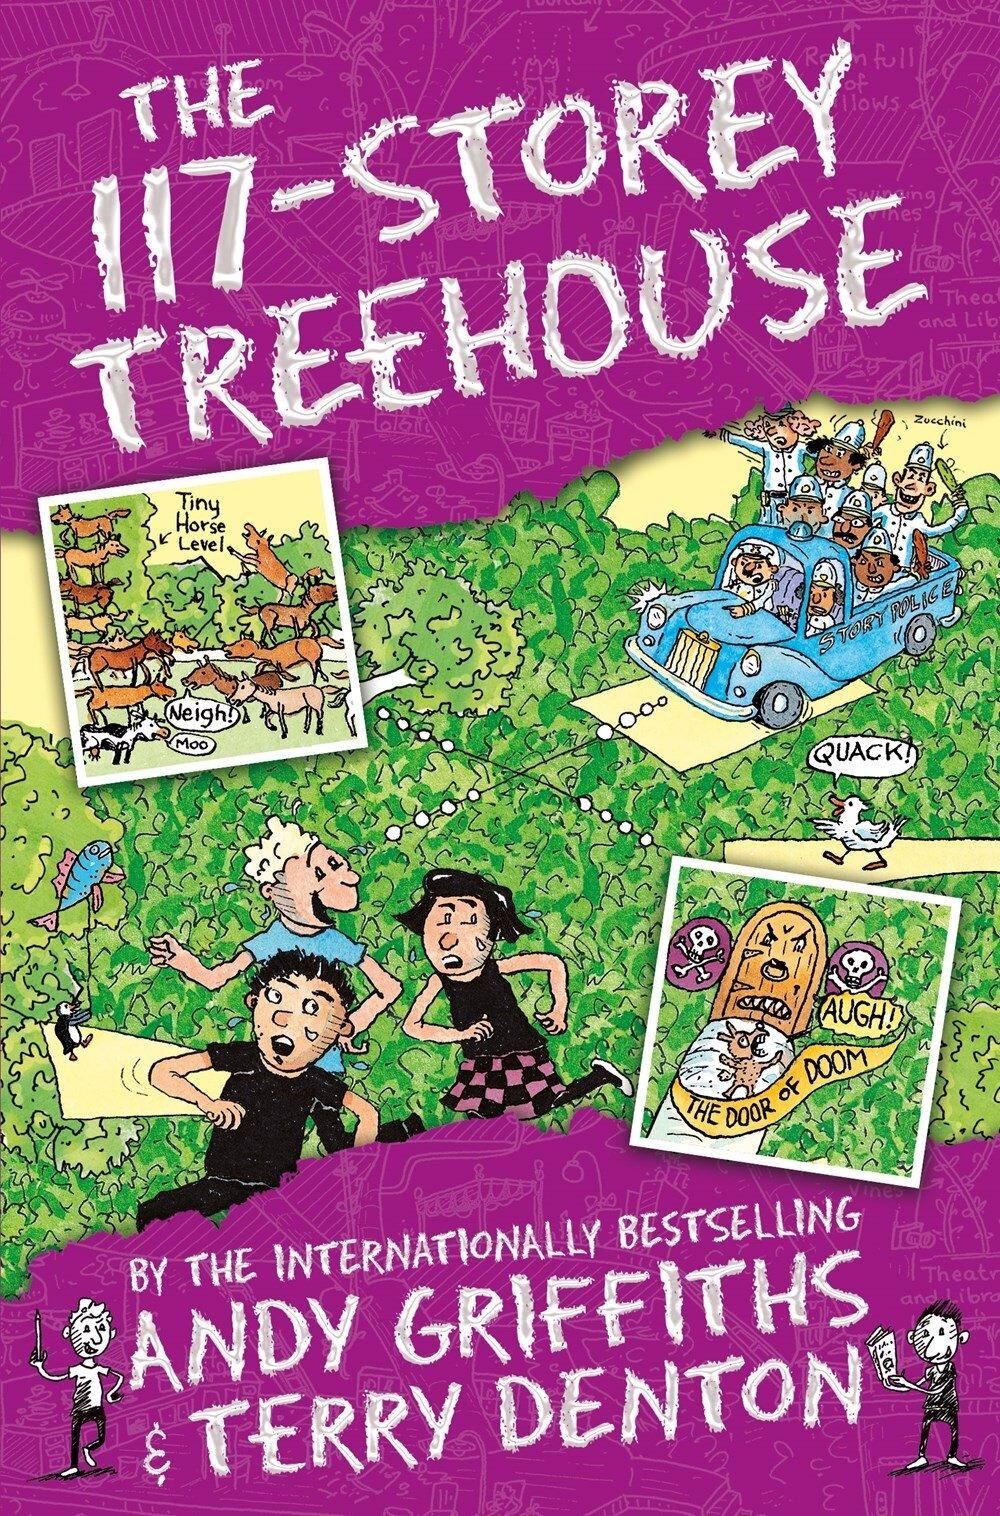 The 117-Storey Treehouse (Paperback, 영국판)